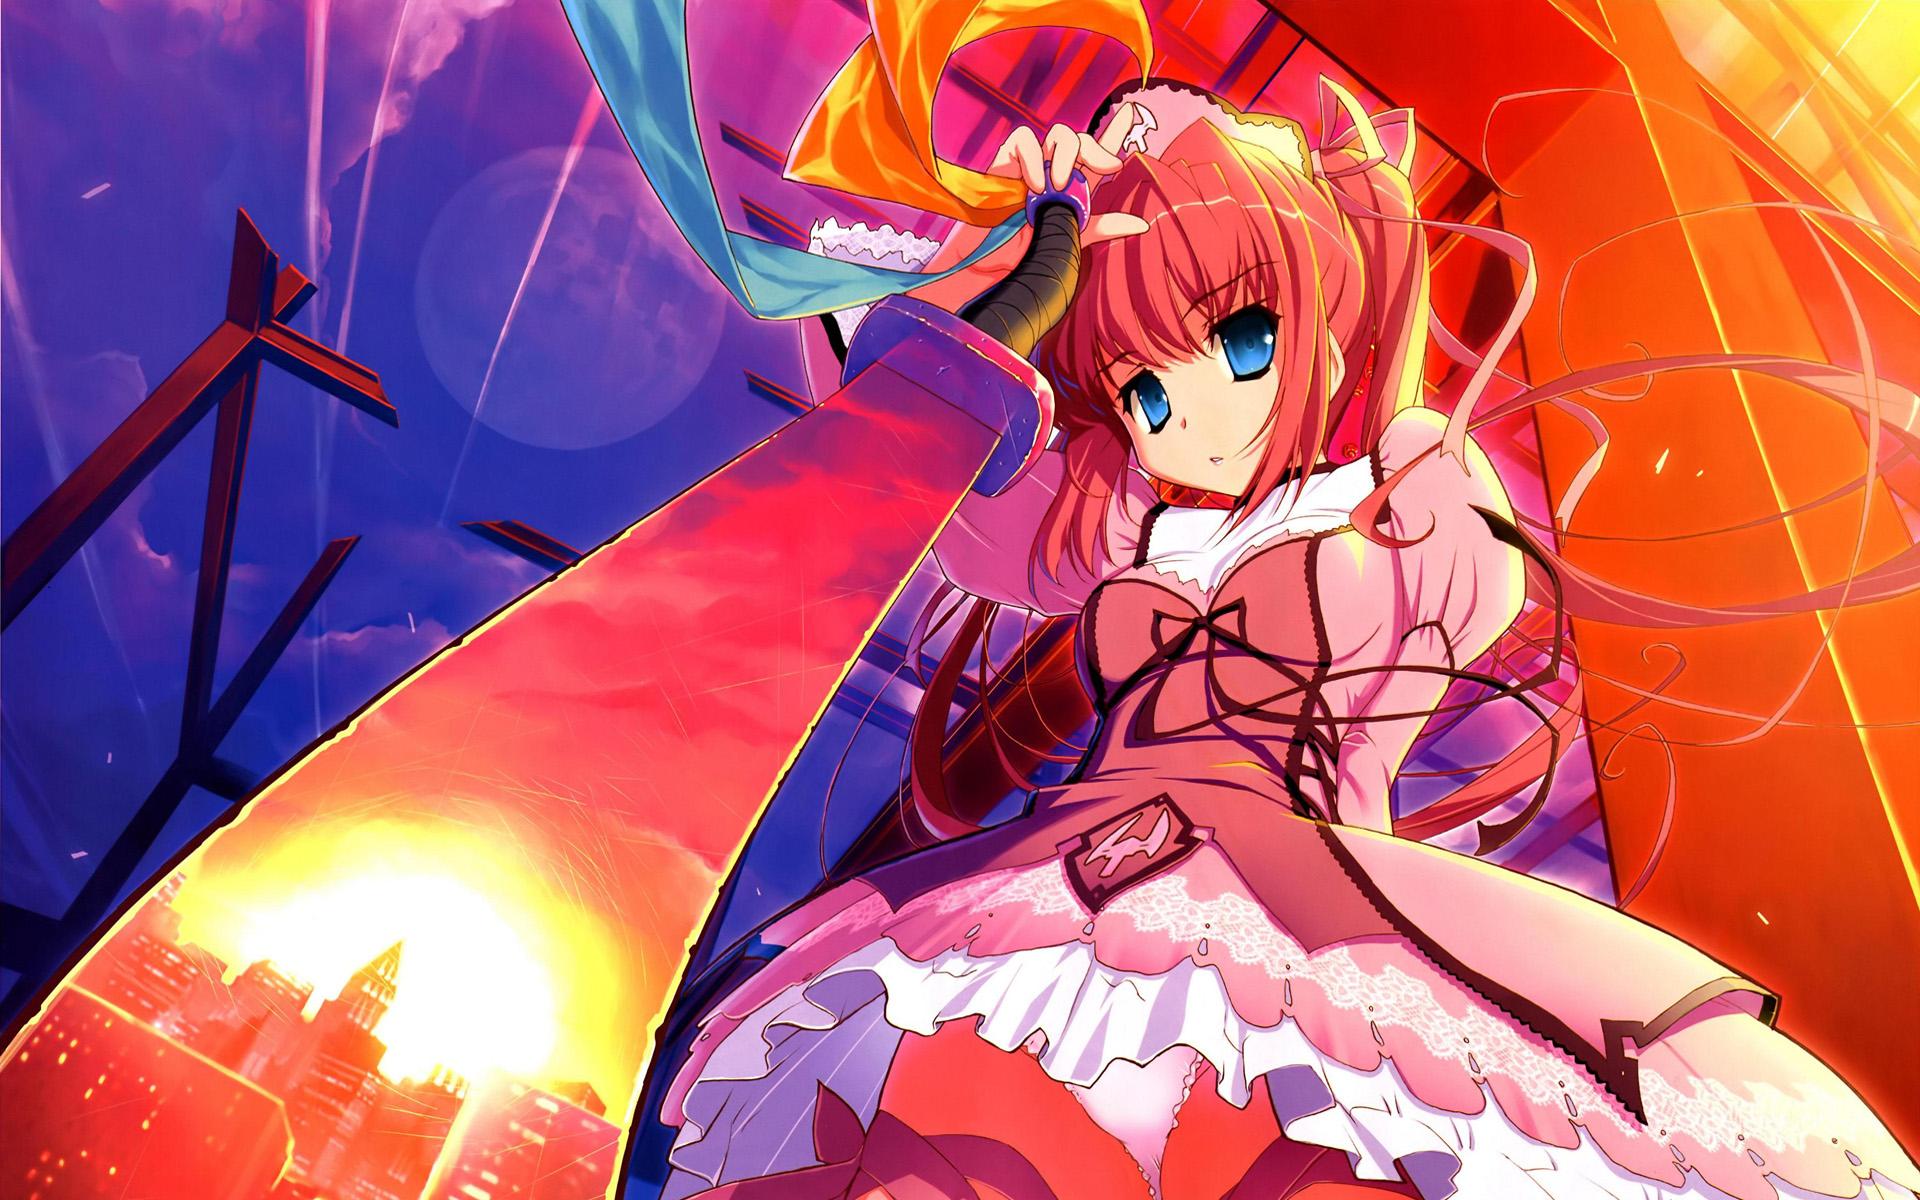 100 Wallpapers de anime HD Konachan-com-62128-akata_itsuki-blue_eyes-moon-sword-underwear-weapon